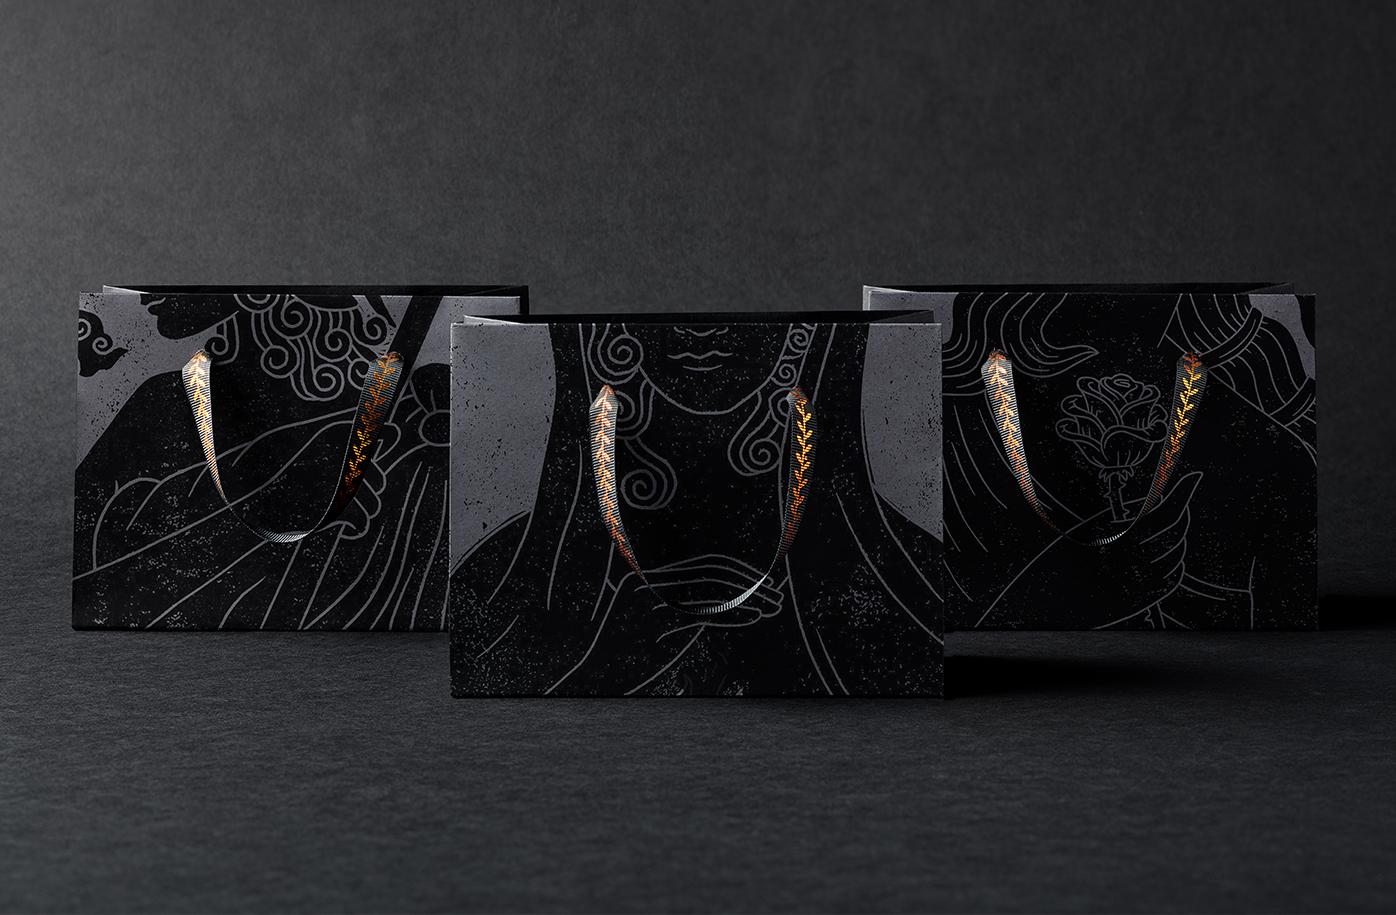 Jewellery Designers gets Distinct Positioning and Branding